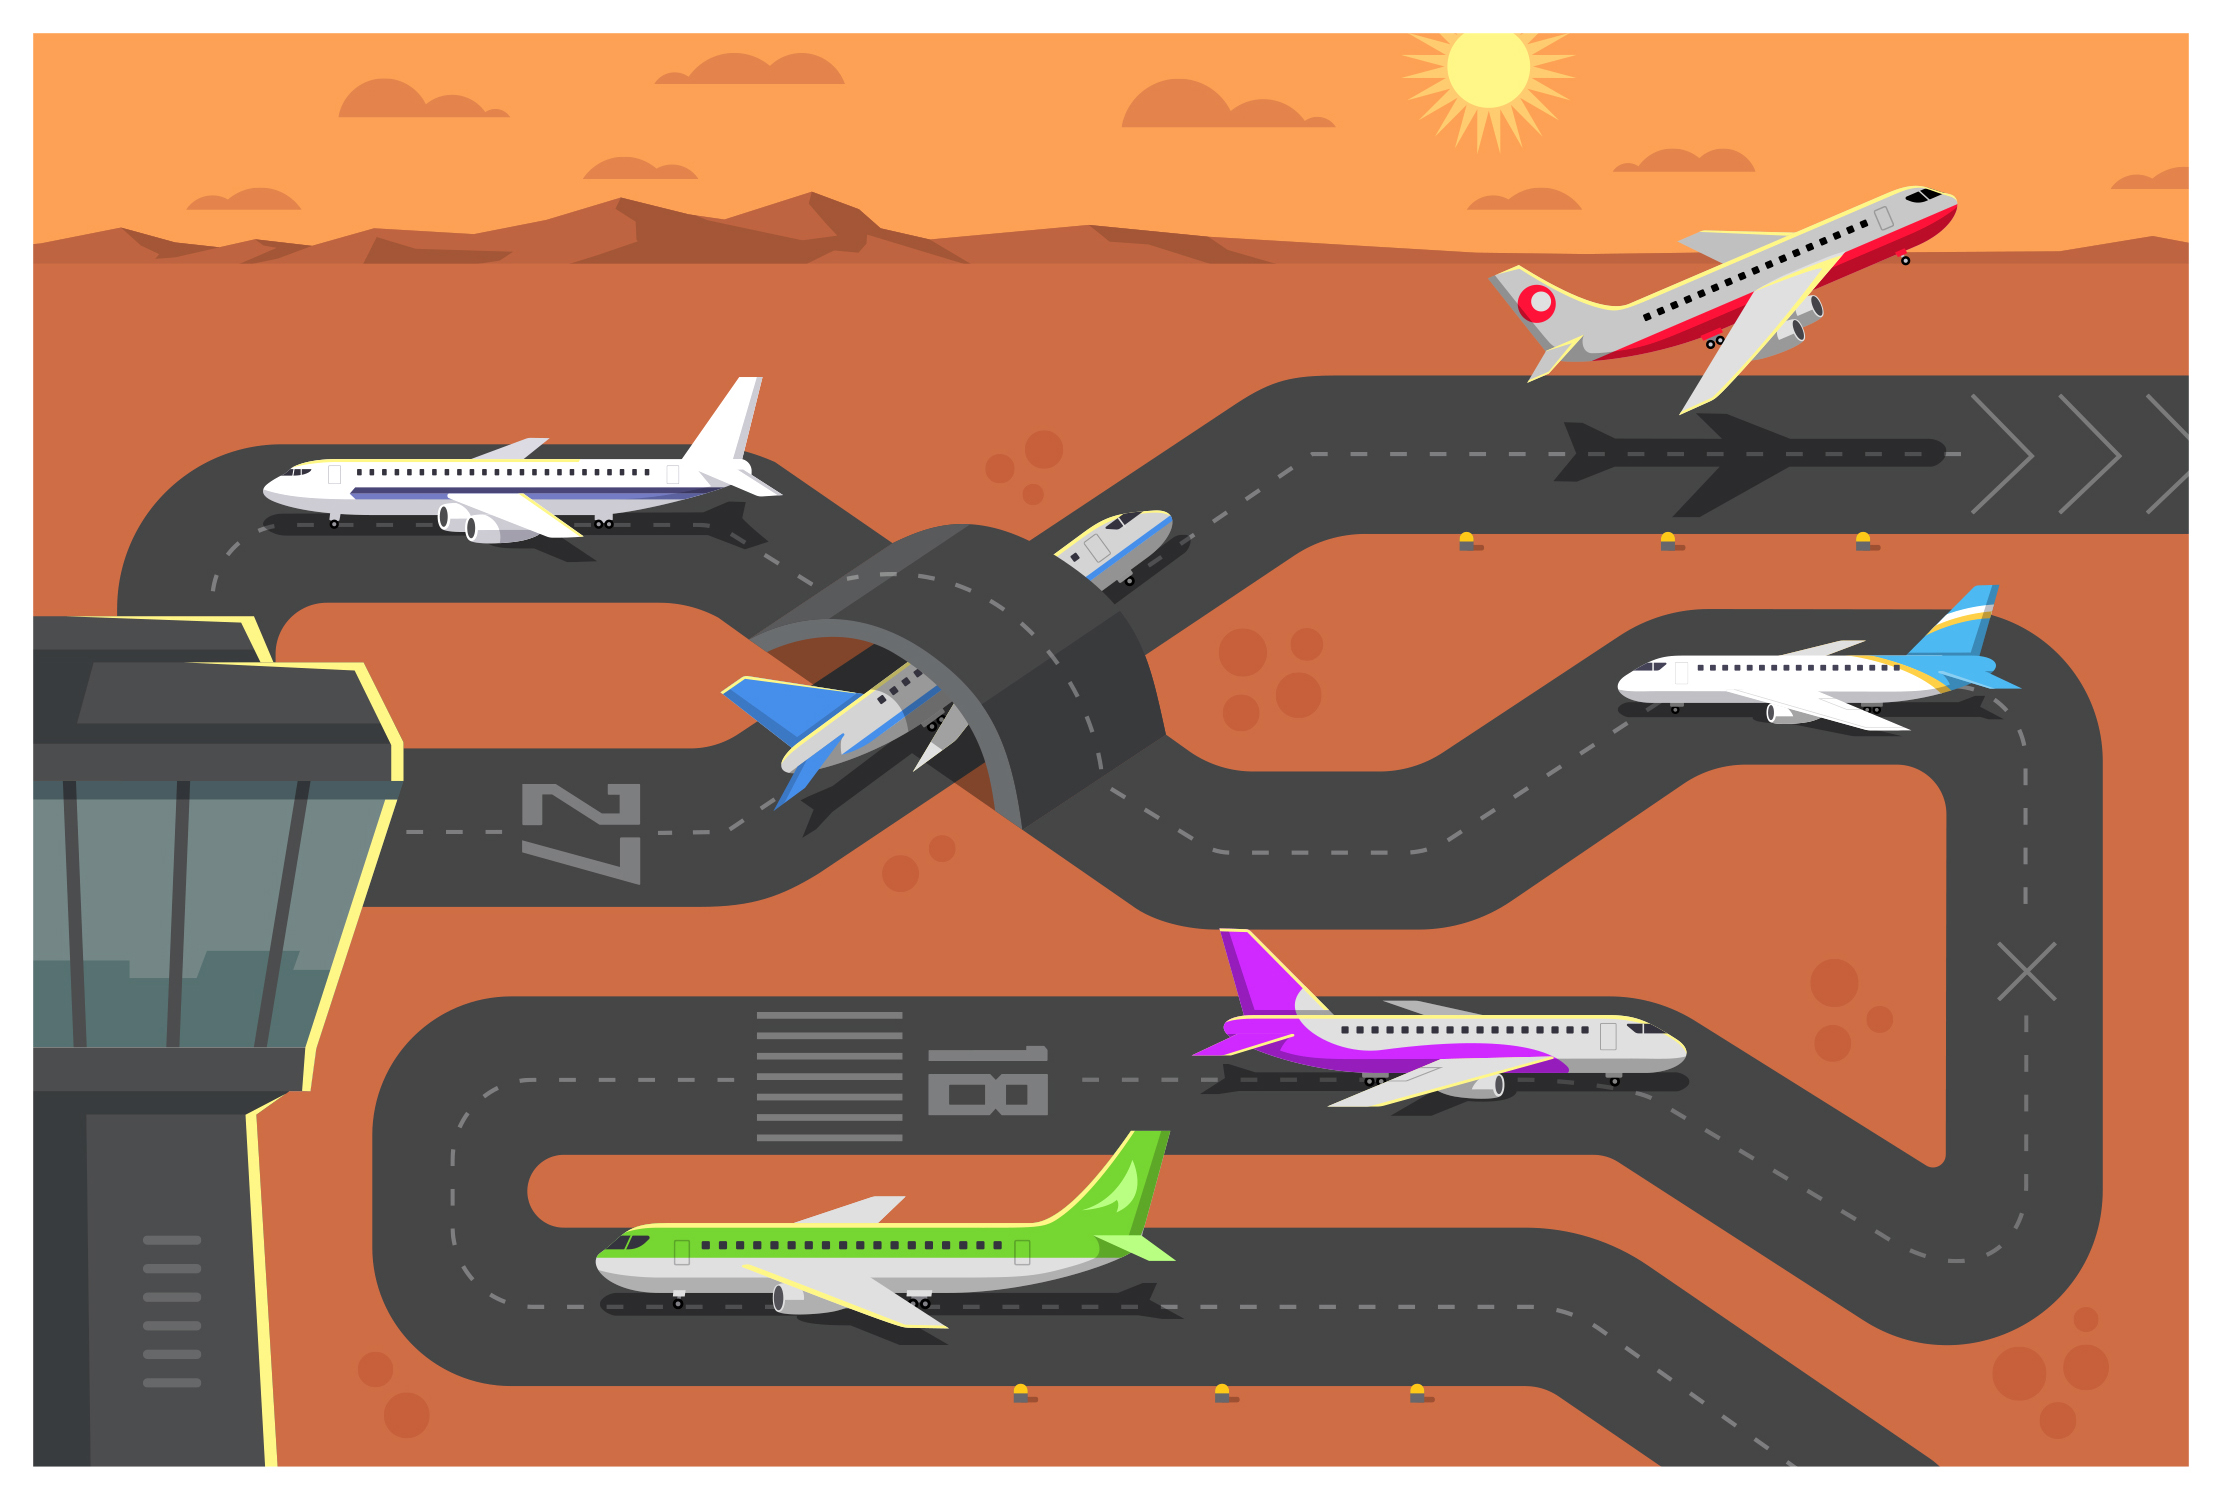 Airport_LongerRunways.jpg